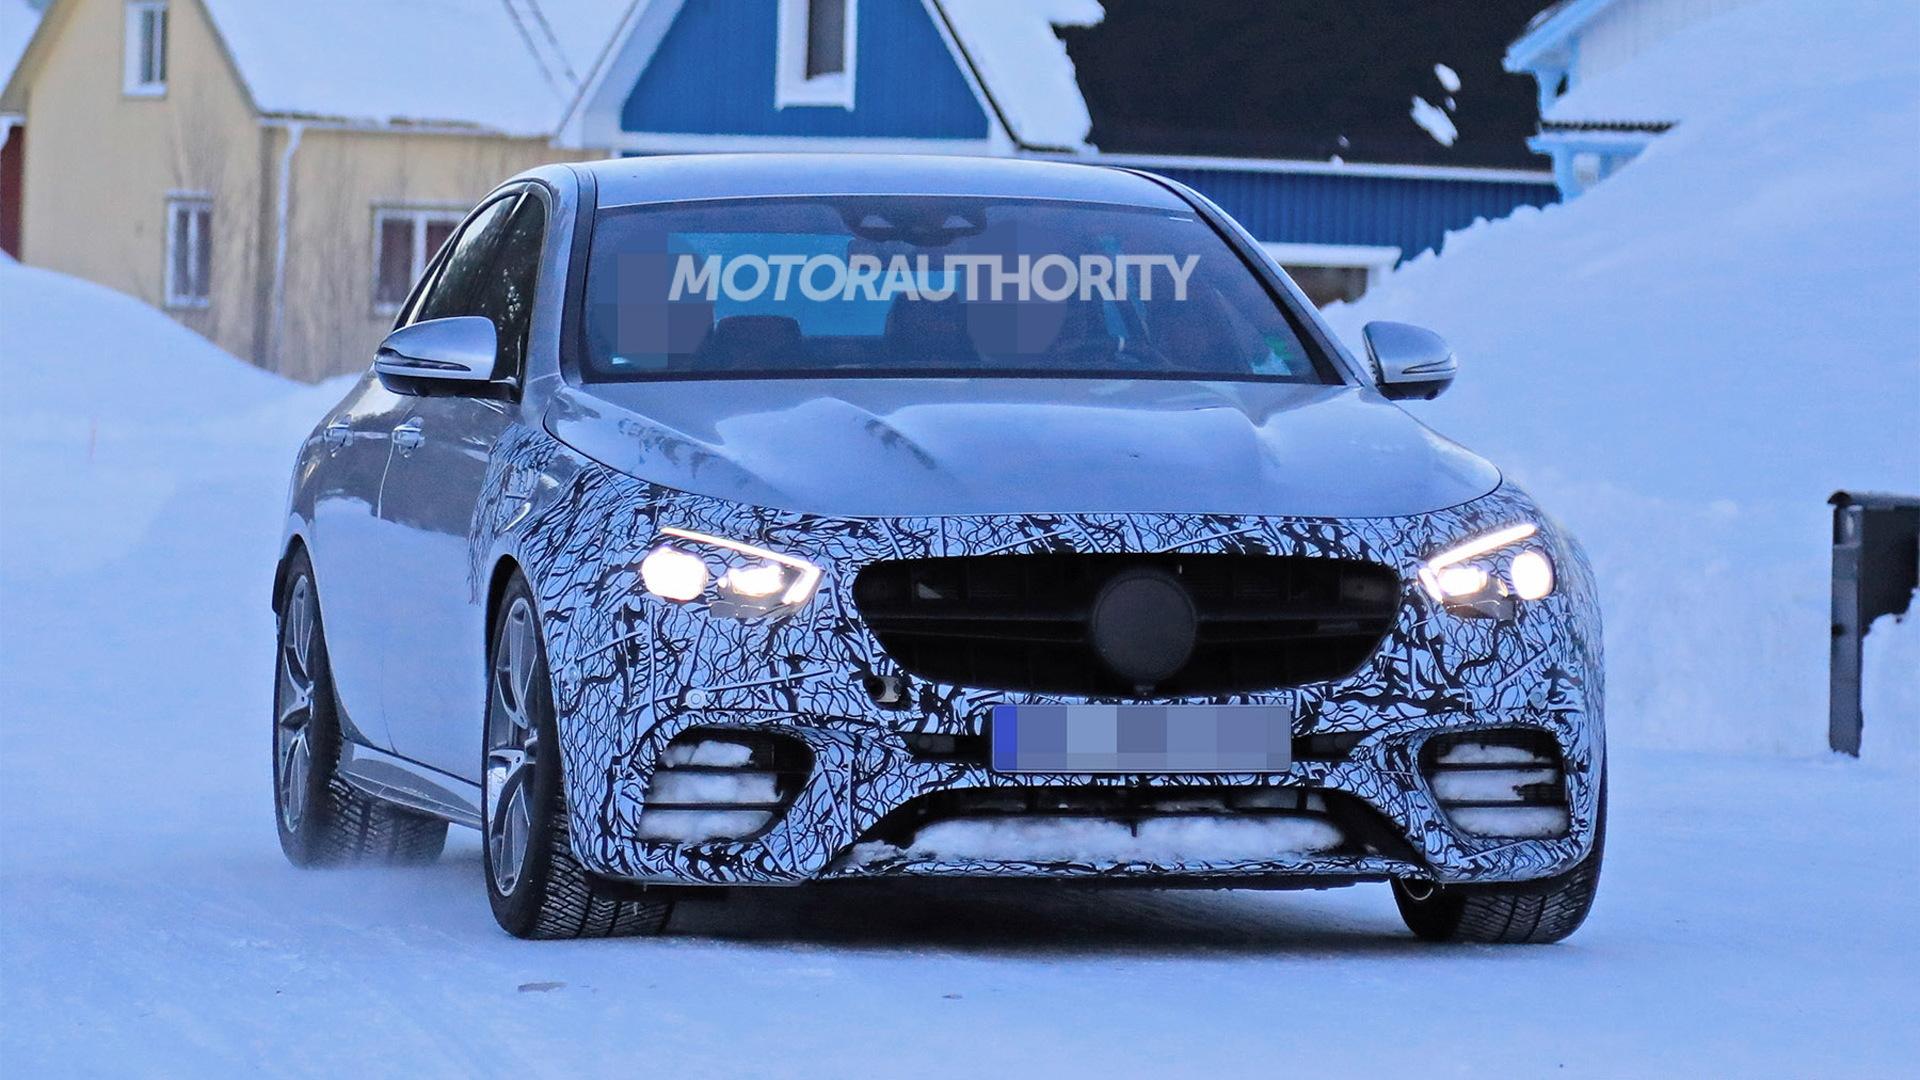 2021 Mercedes-AMG E63 facelift spy shots - Image via S. Baldauf/SB-Medien